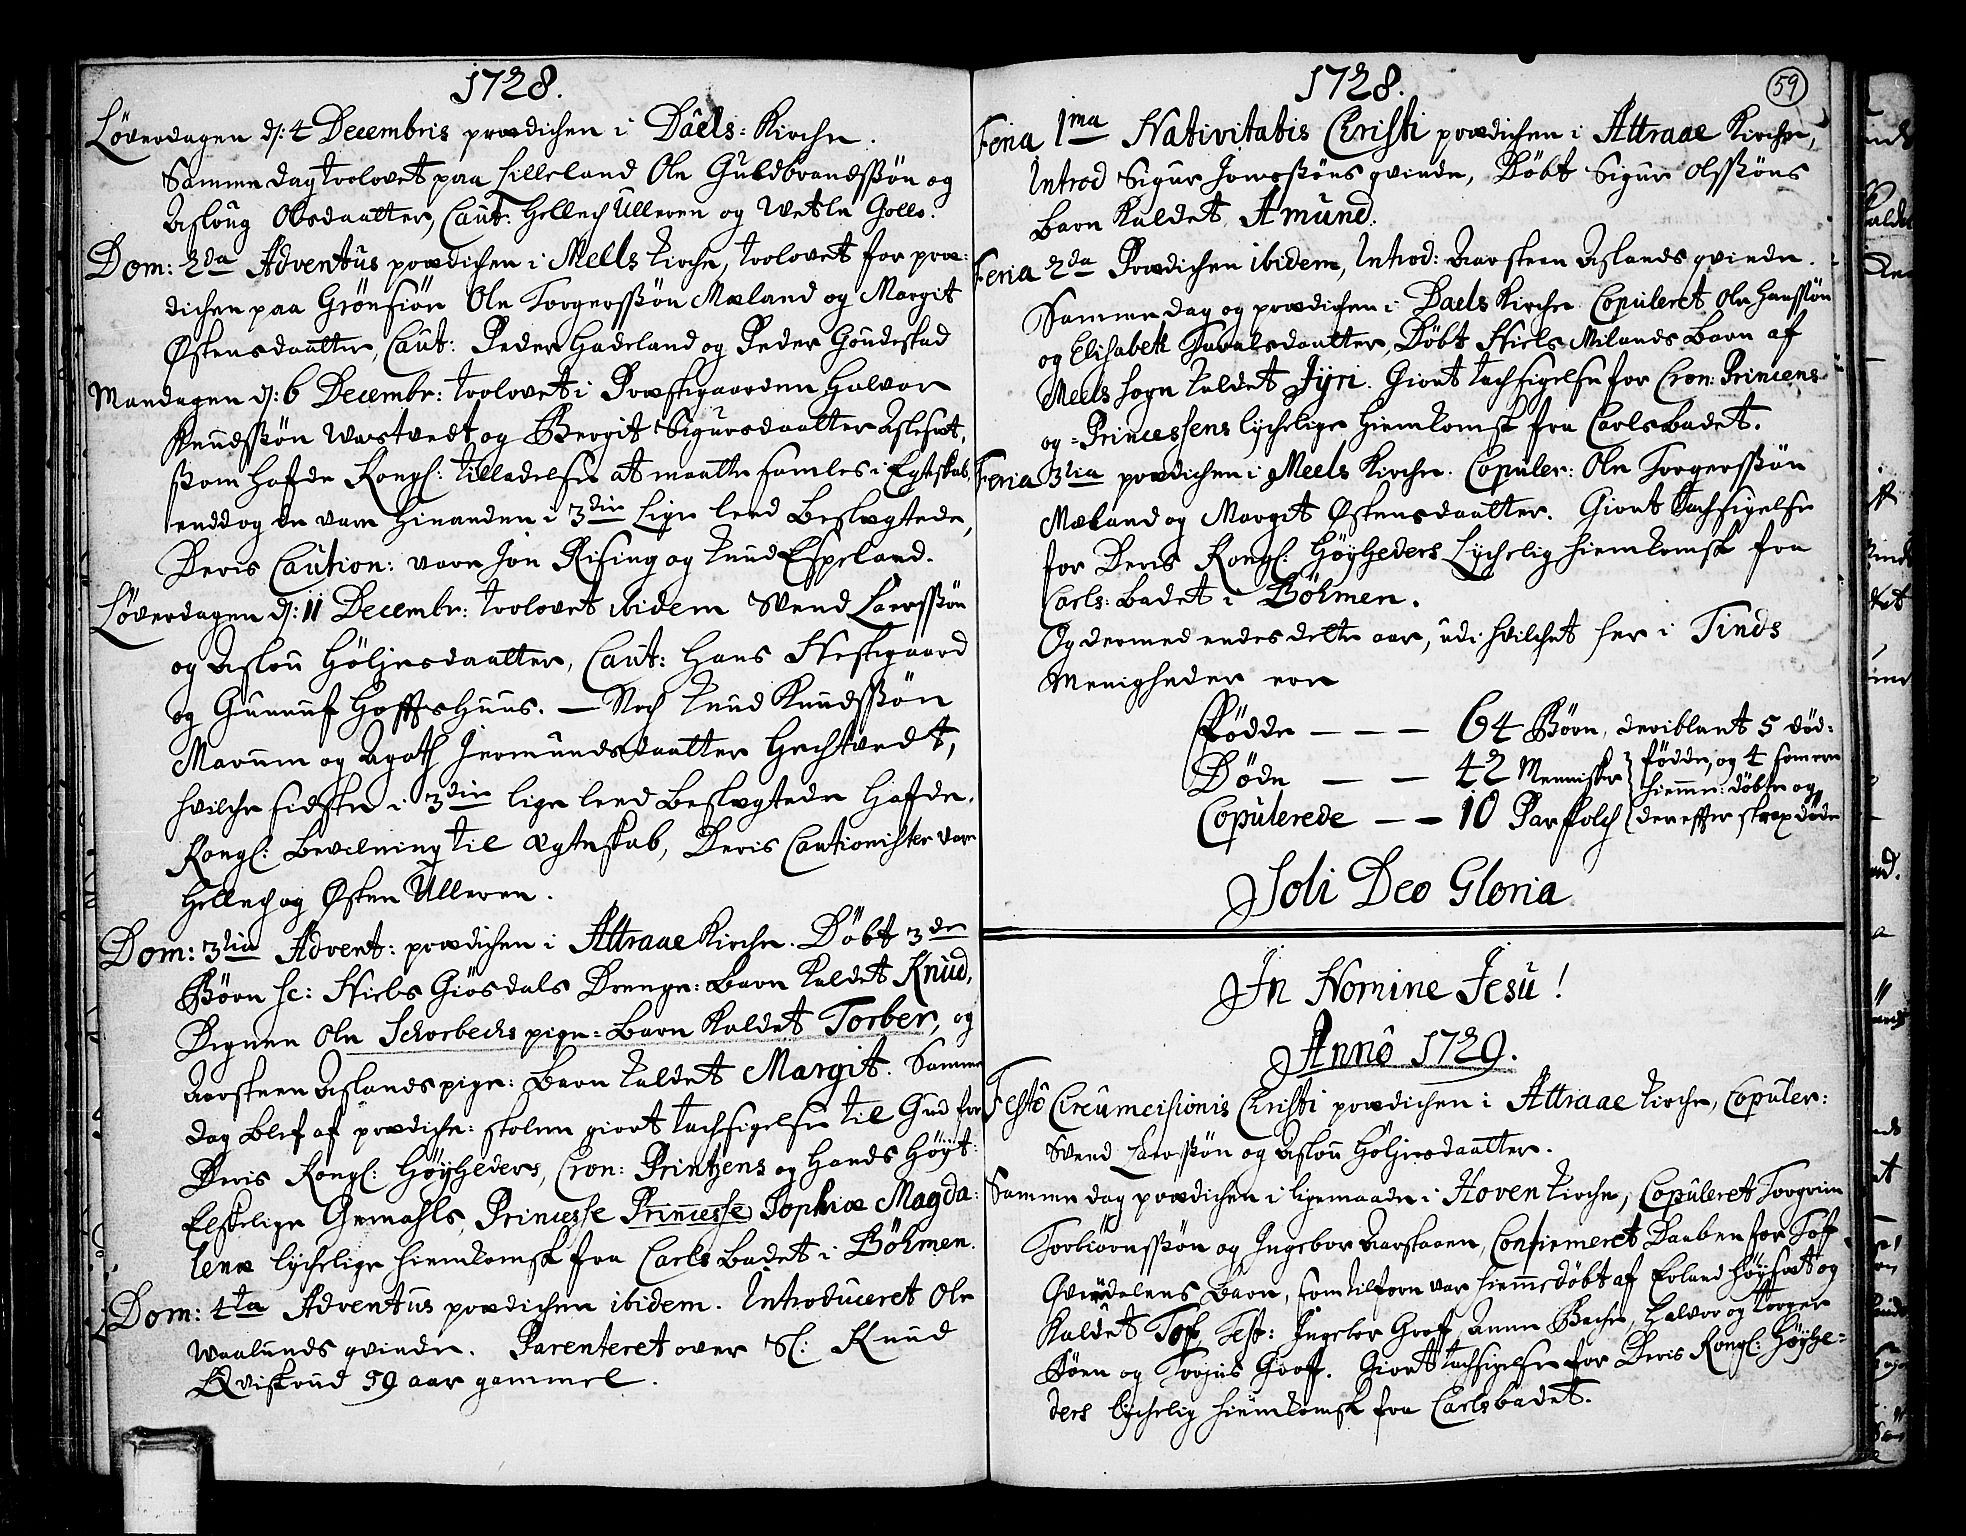 SAKO, Tinn kirkebøker, F/Fa/L0001: Ministerialbok nr. I 1, 1717-1734, s. 59